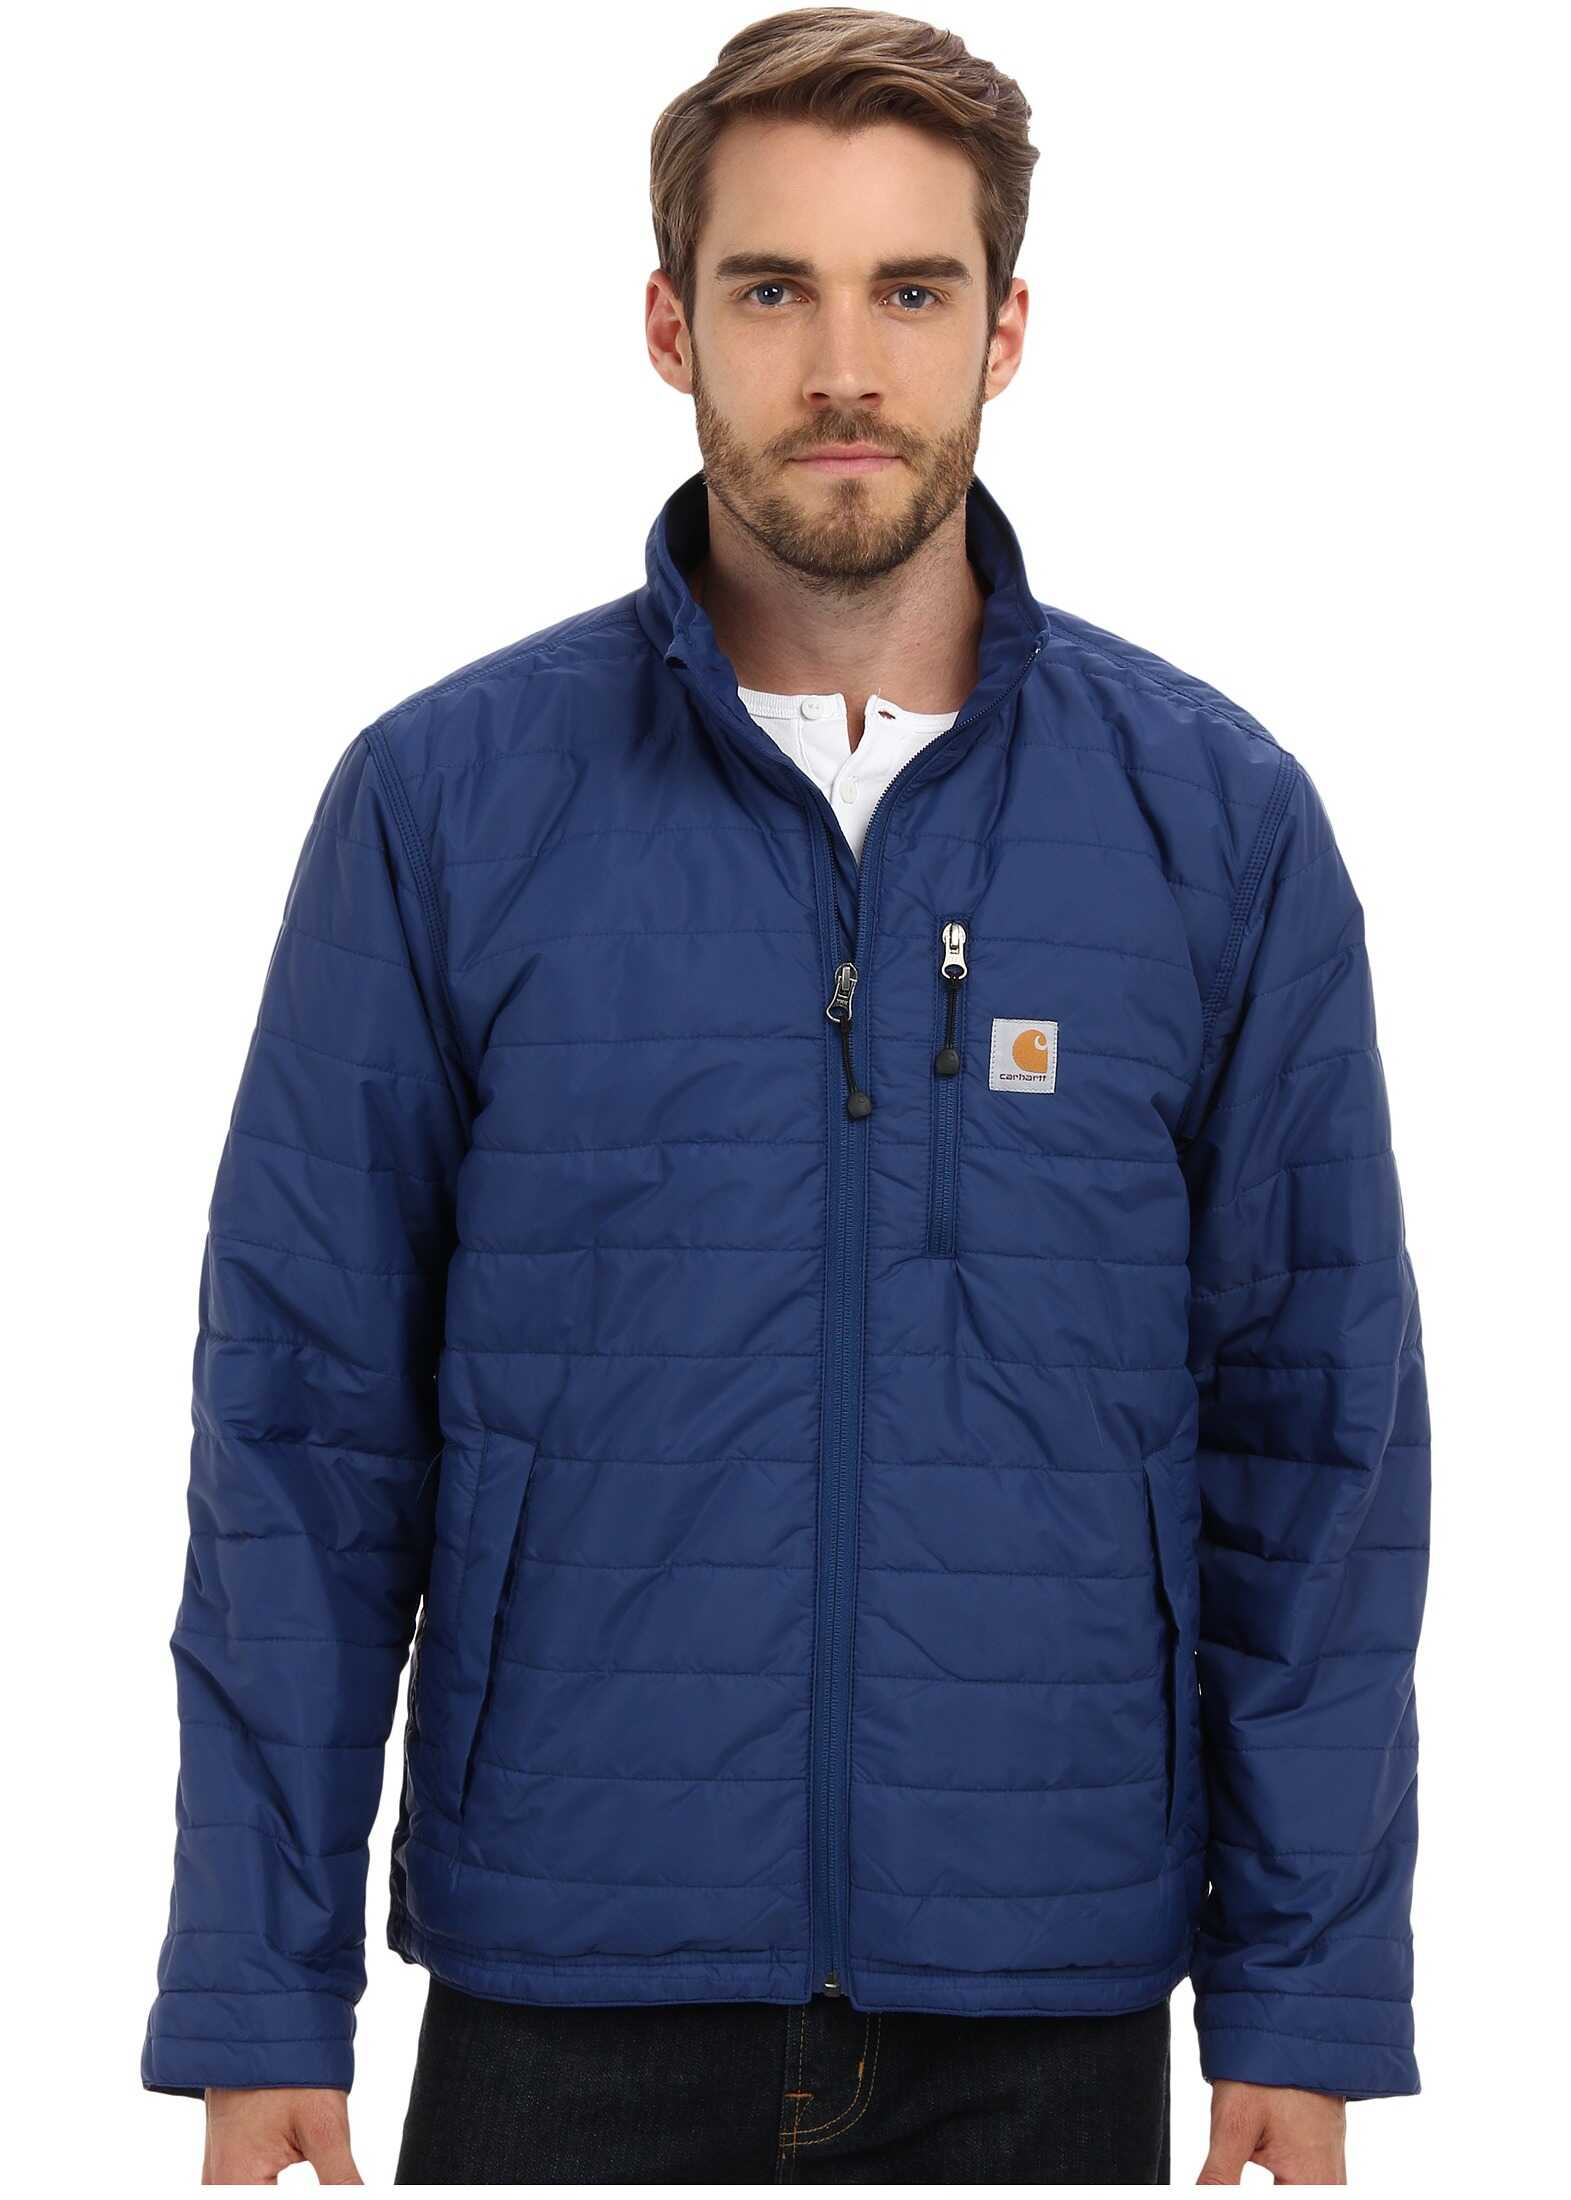 Carhartt Big & Tall Gilliam Jacket* Dark Cobalt Blue